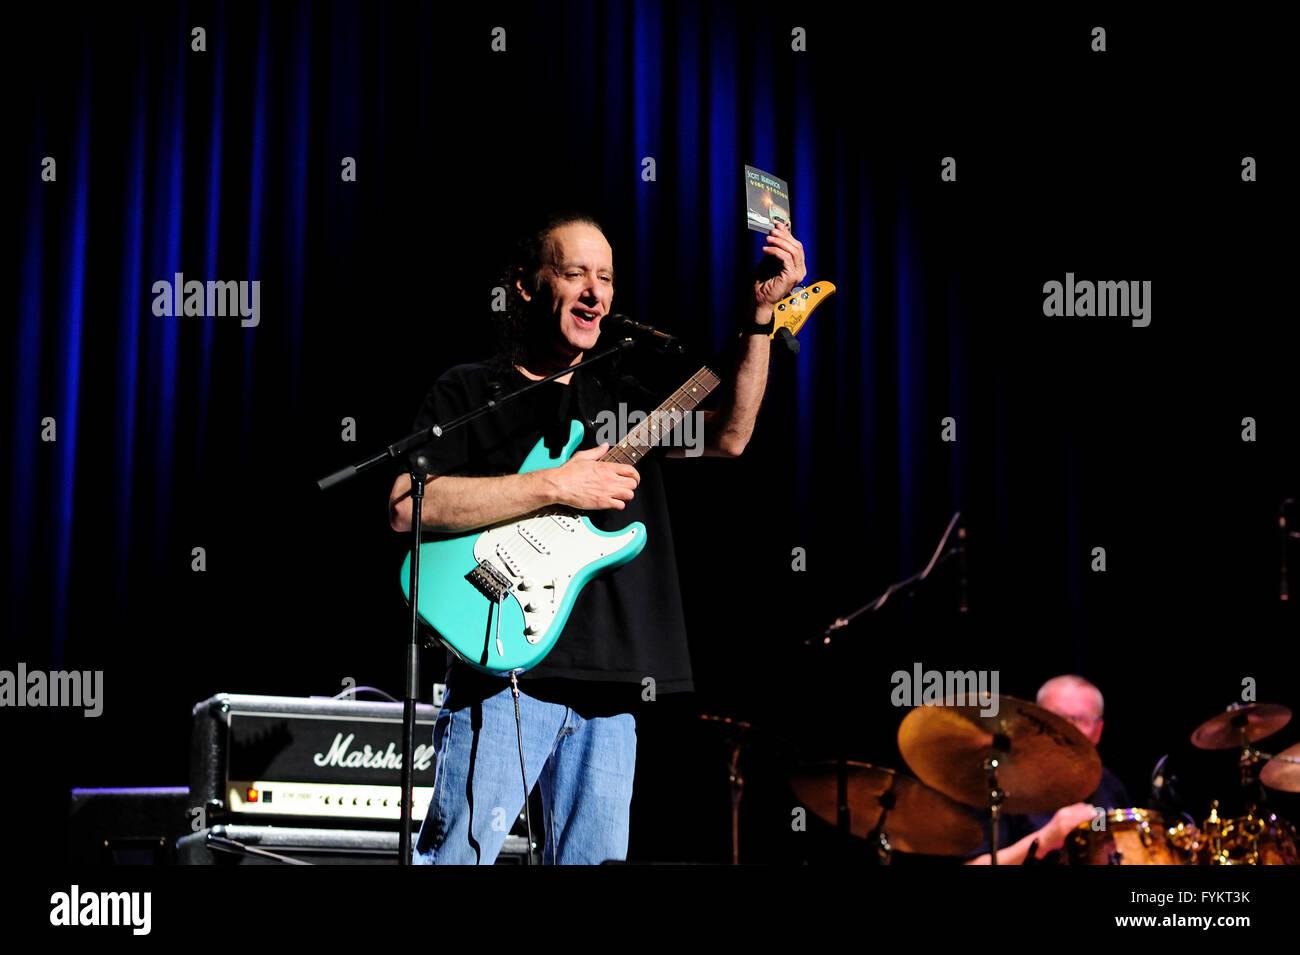 Swidnica, Poland, 27 april 2016, Scott Henderson, guitar player, new album Vibe Station, europe spring tour, bass - Stock Image